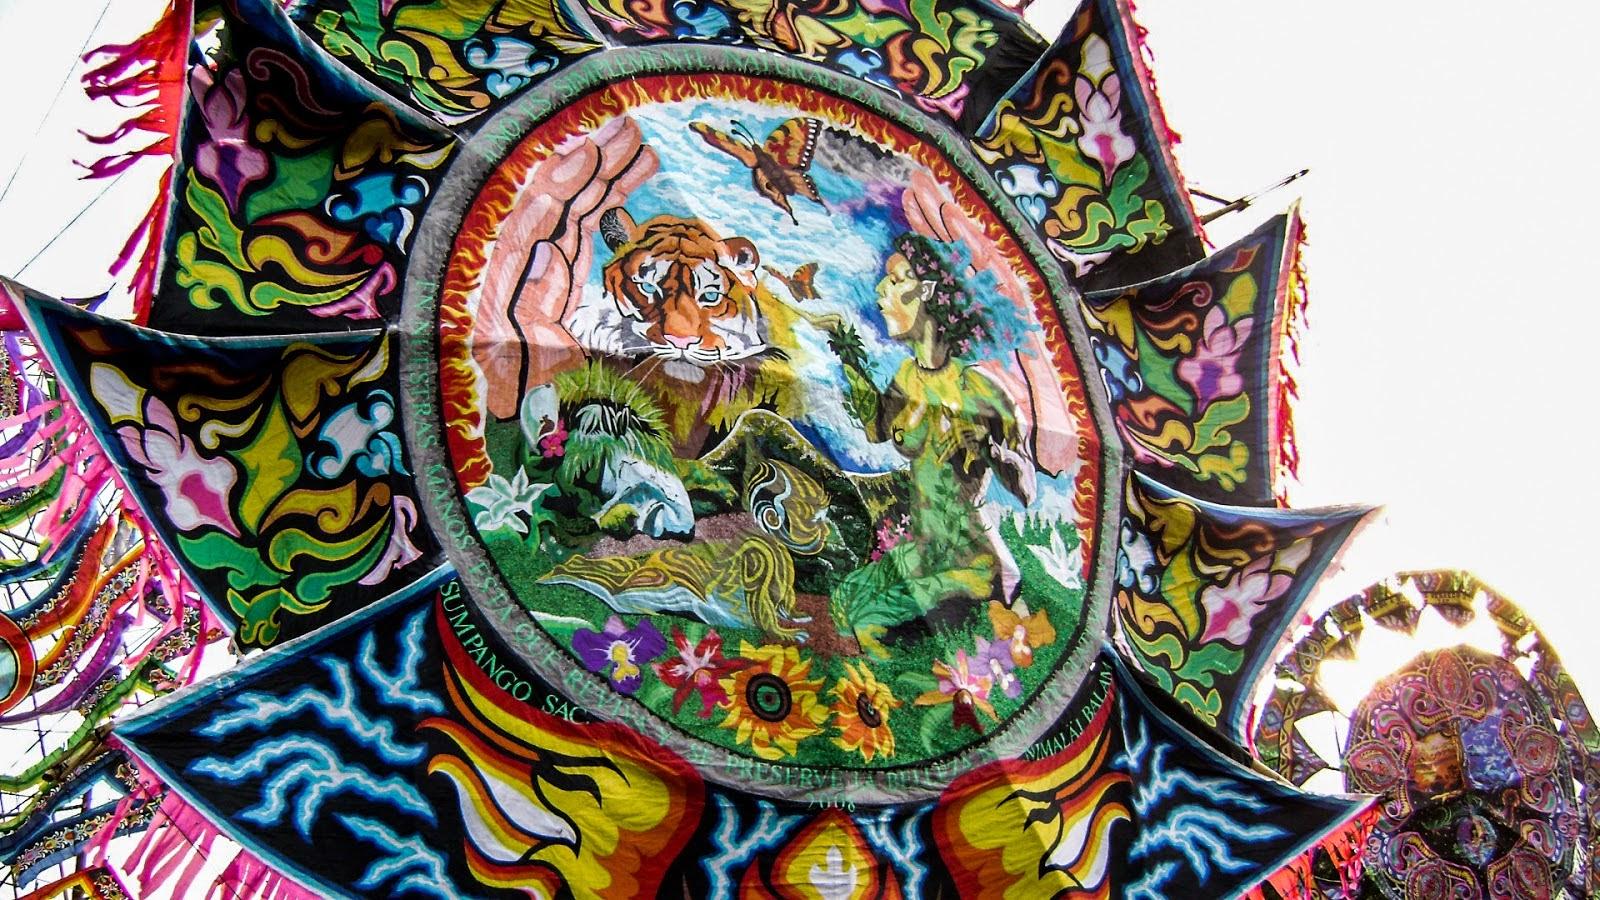 nterior design guatemala, interiores guatemala, guatemala diseño de interiores, diseño de interiores guatemala, decoración guatelamala, Atelier Taller de Espacios, diseño guatemala, barriletes sumpanco